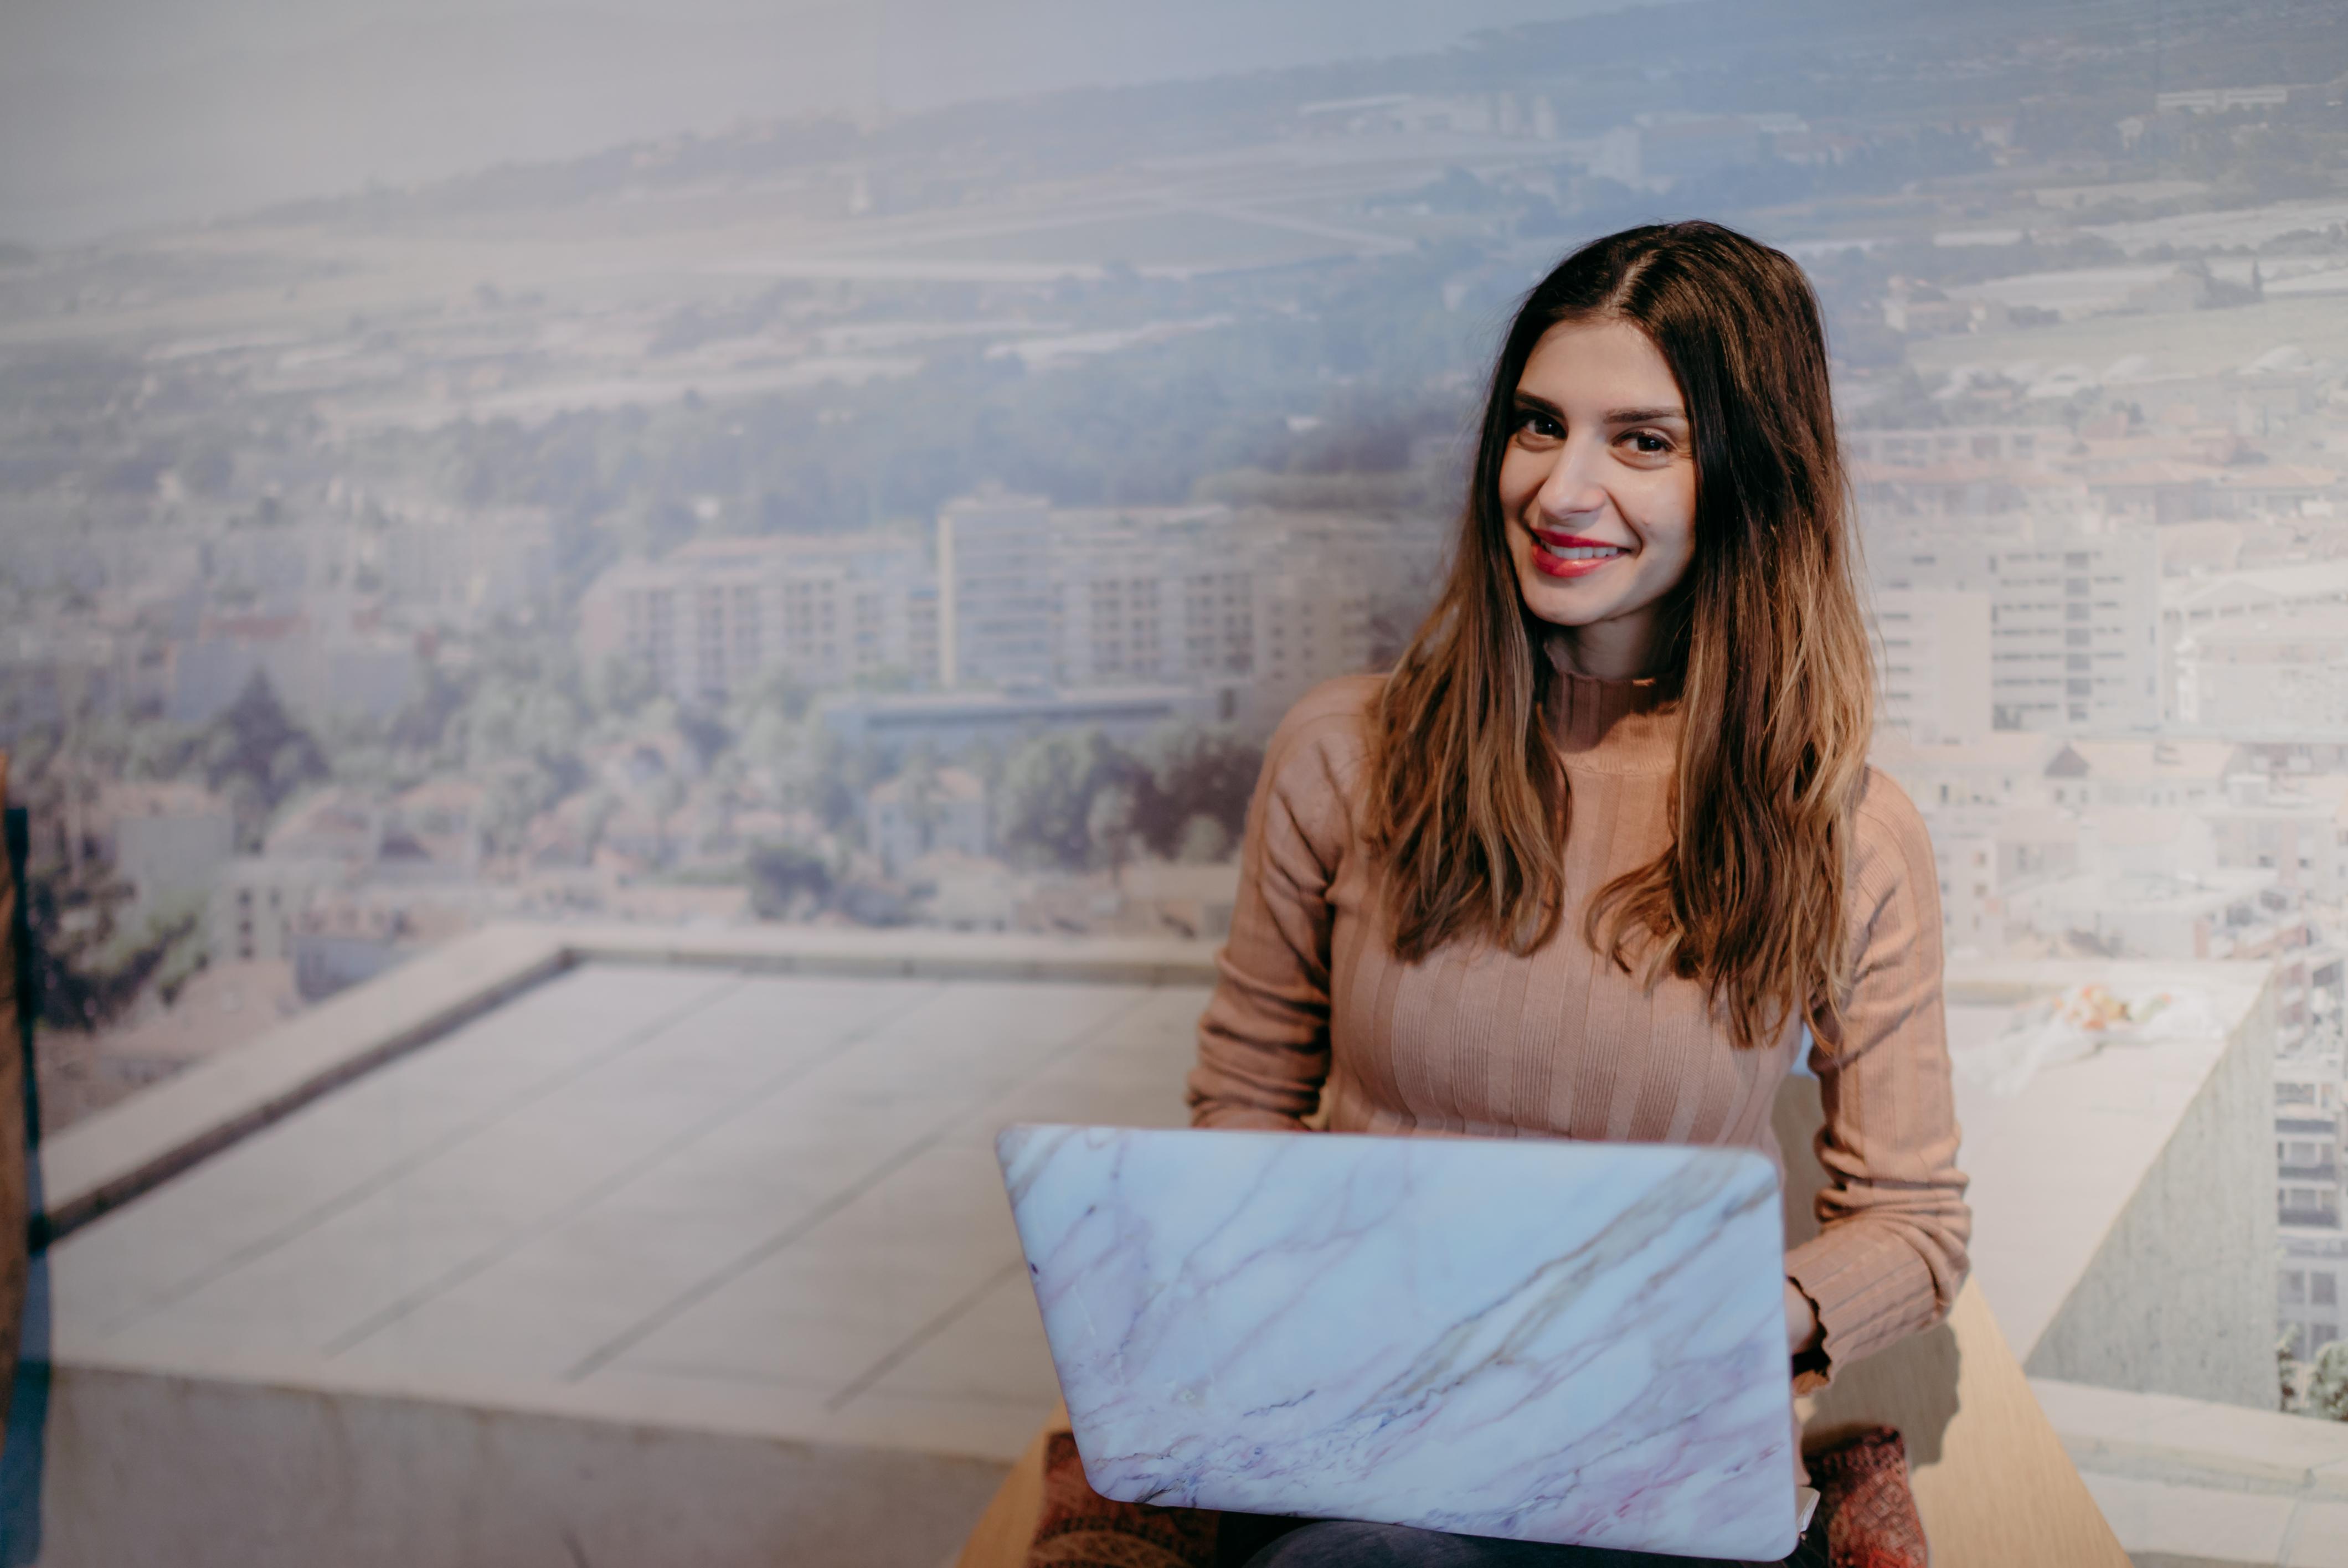 Iglika Mateeva-Drincheva | UX/UI Designer